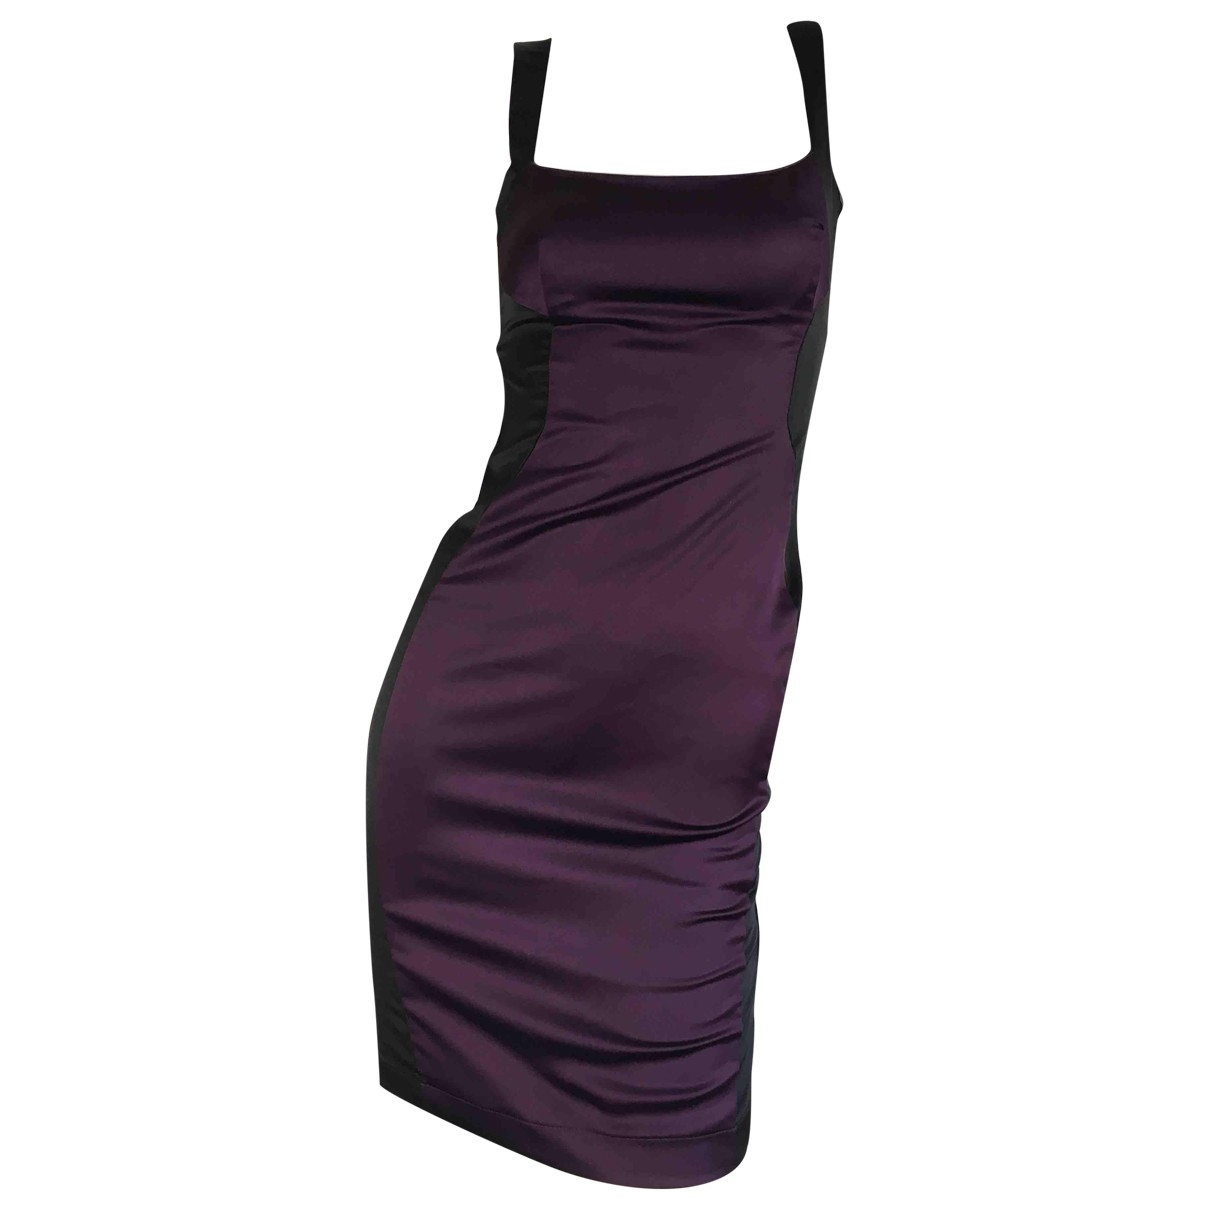 Just Cavalli \N Kleid in  Lila Polyester